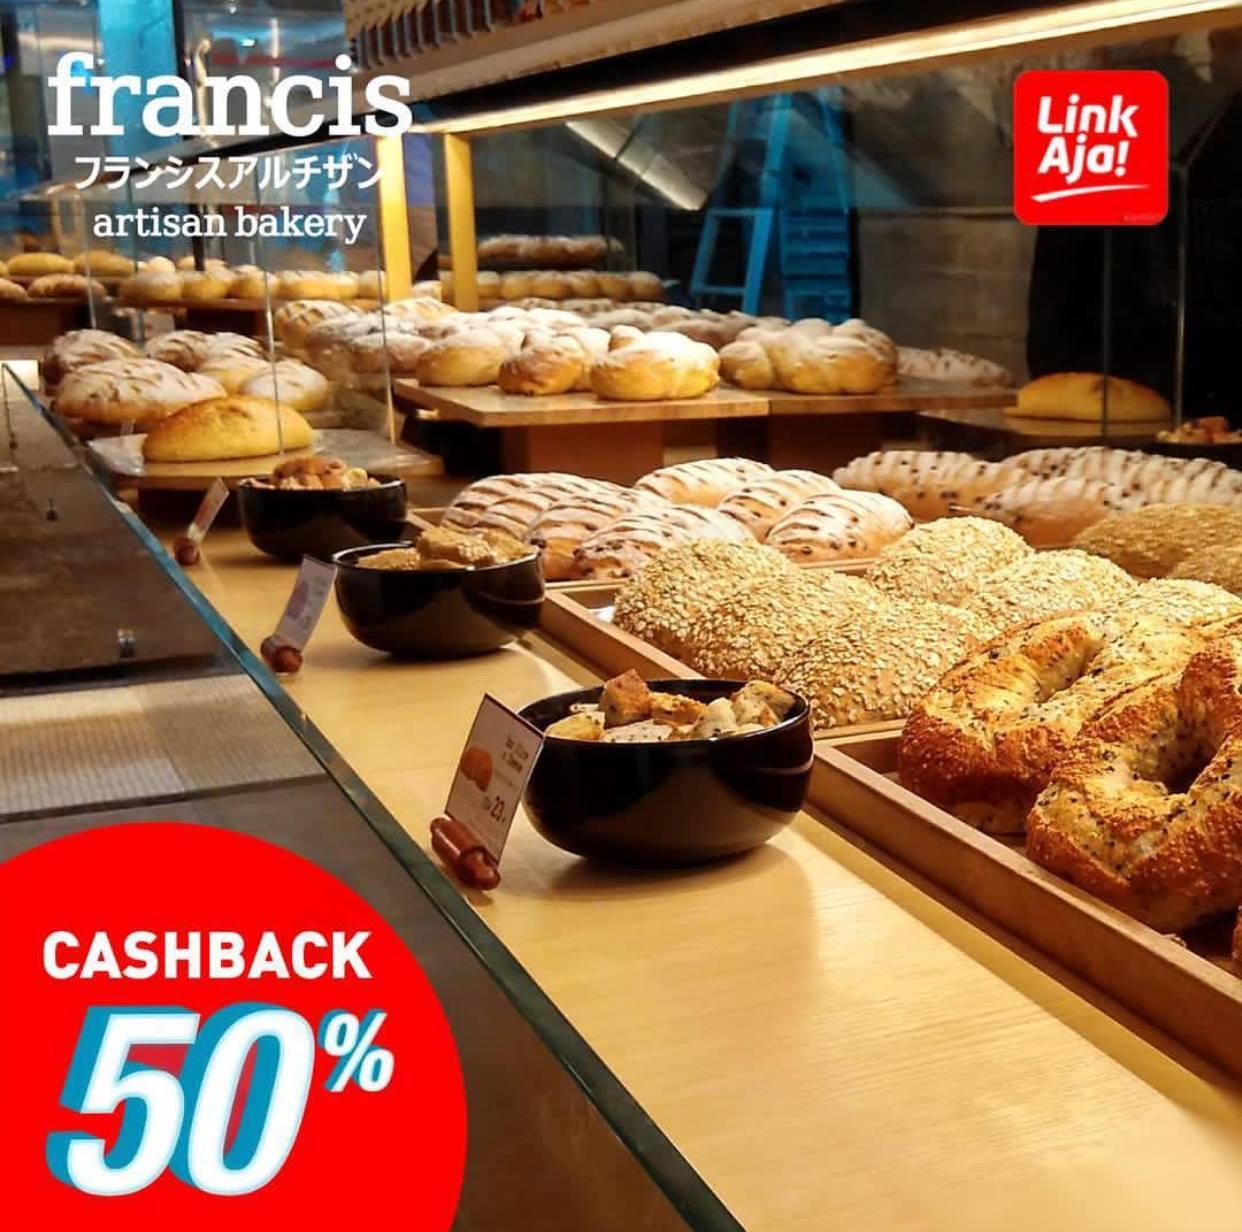 Francis Artisan Bakery Promo CASHBACK 50% dengan LinkAja